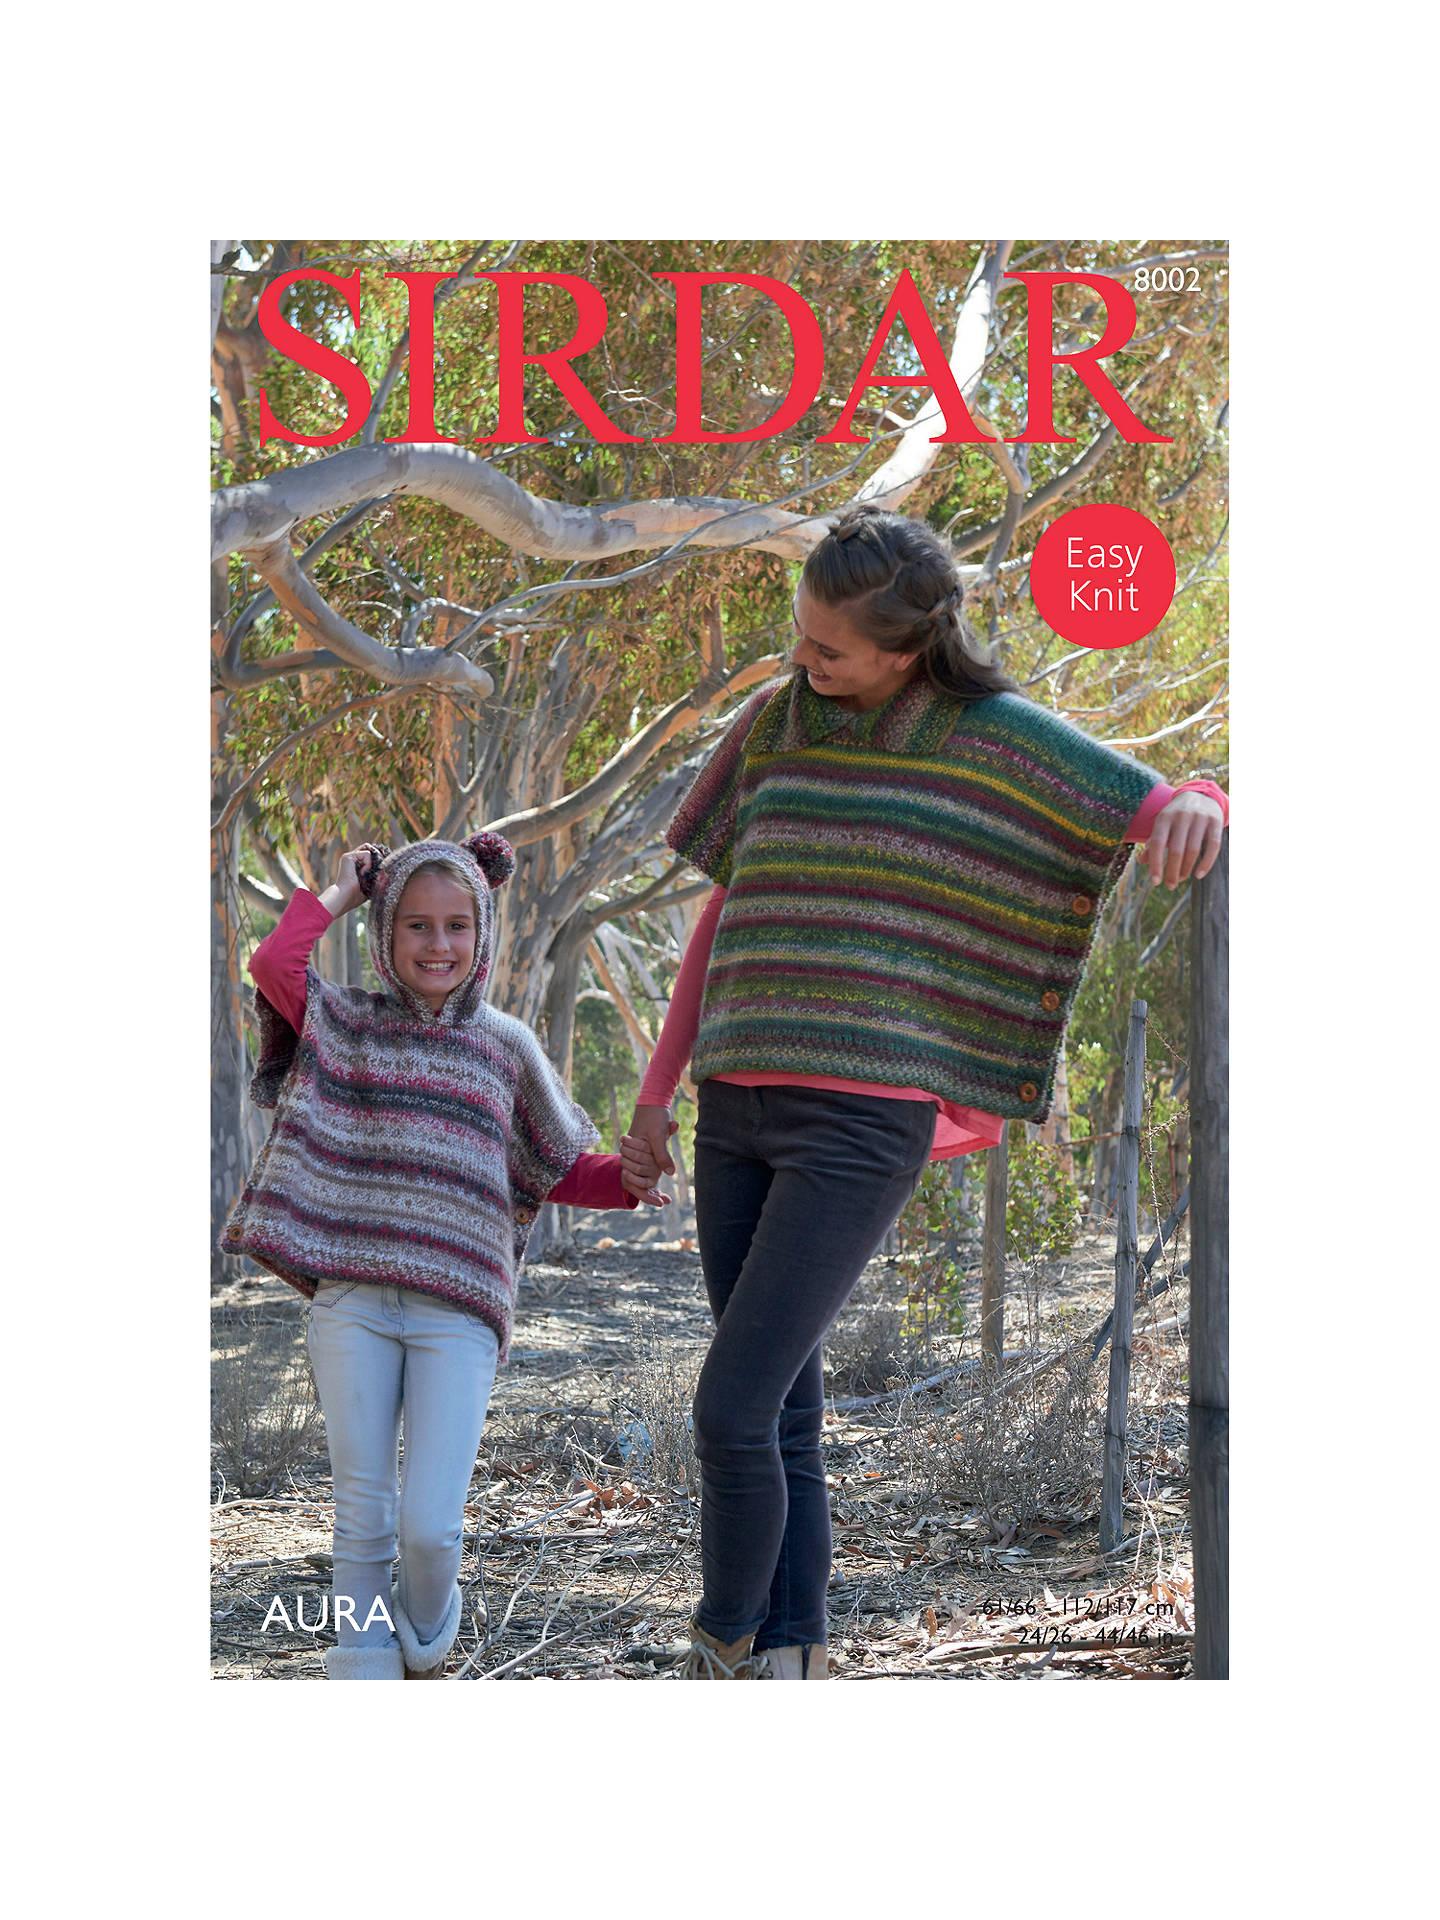 Sirdar Aura Chunky Ponchos Knitting Pattern, 8002